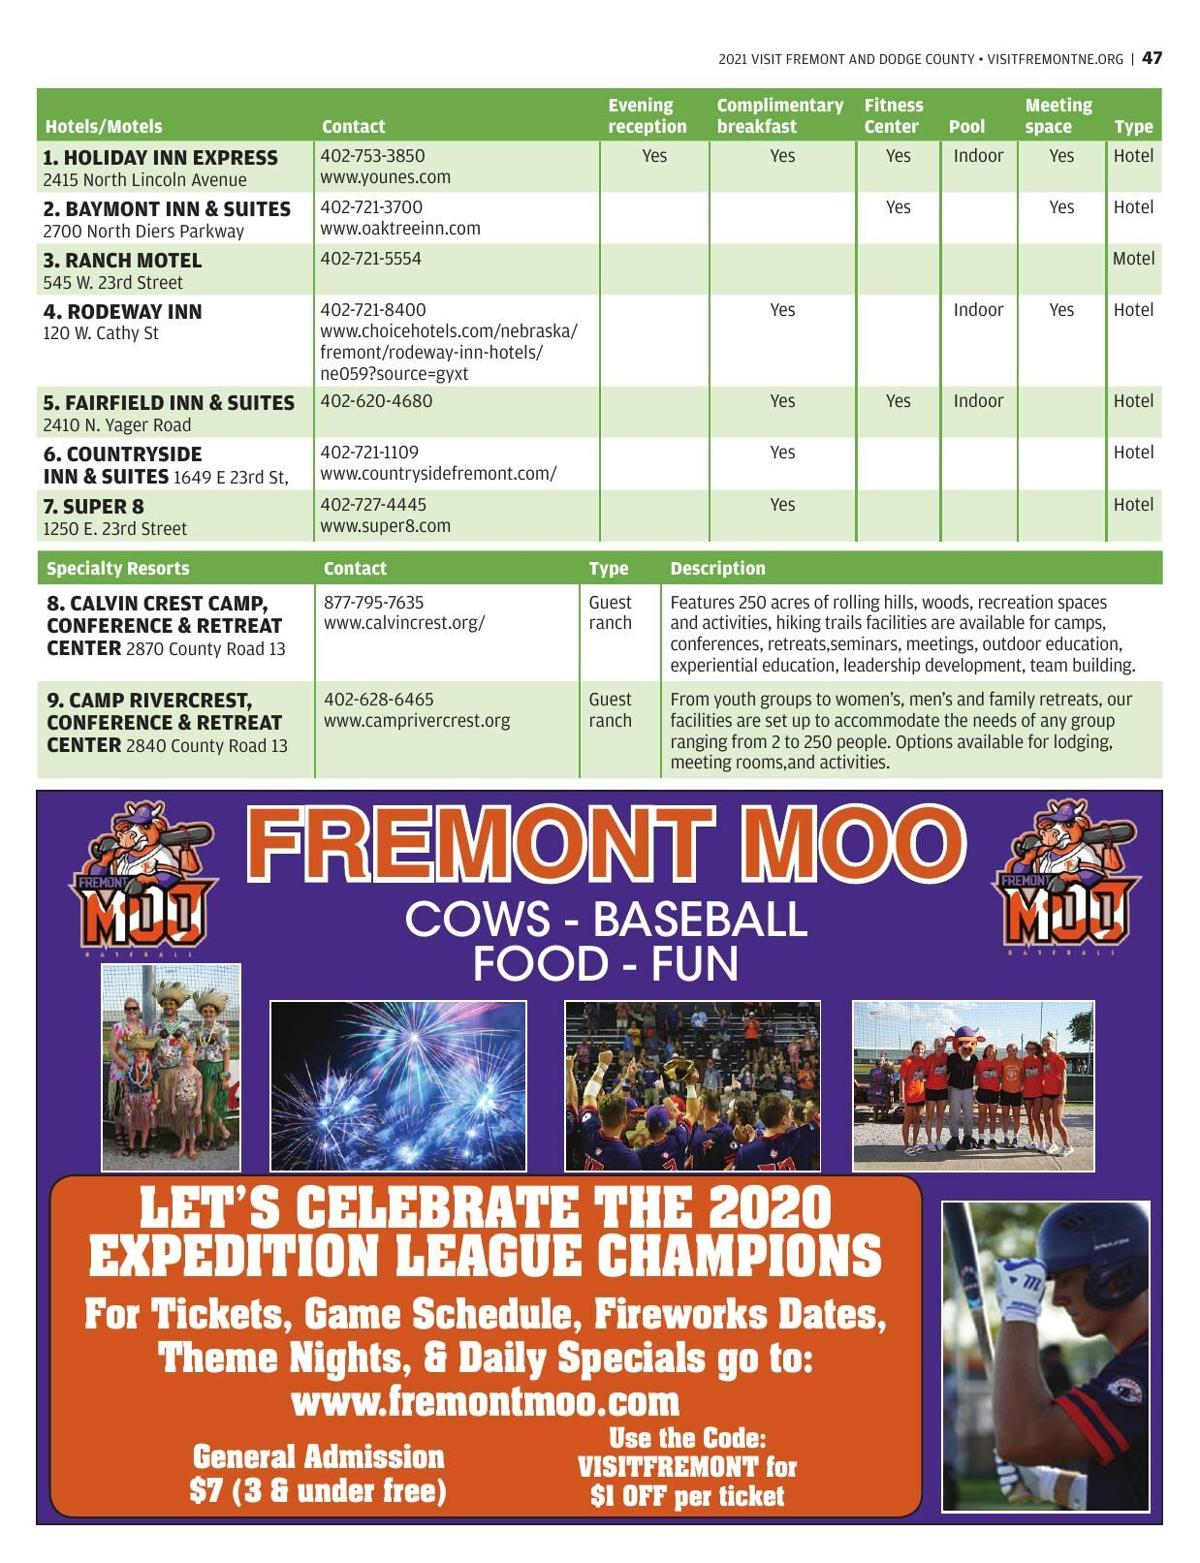 Visit Fremont and Dodge County 2021 47.pdf